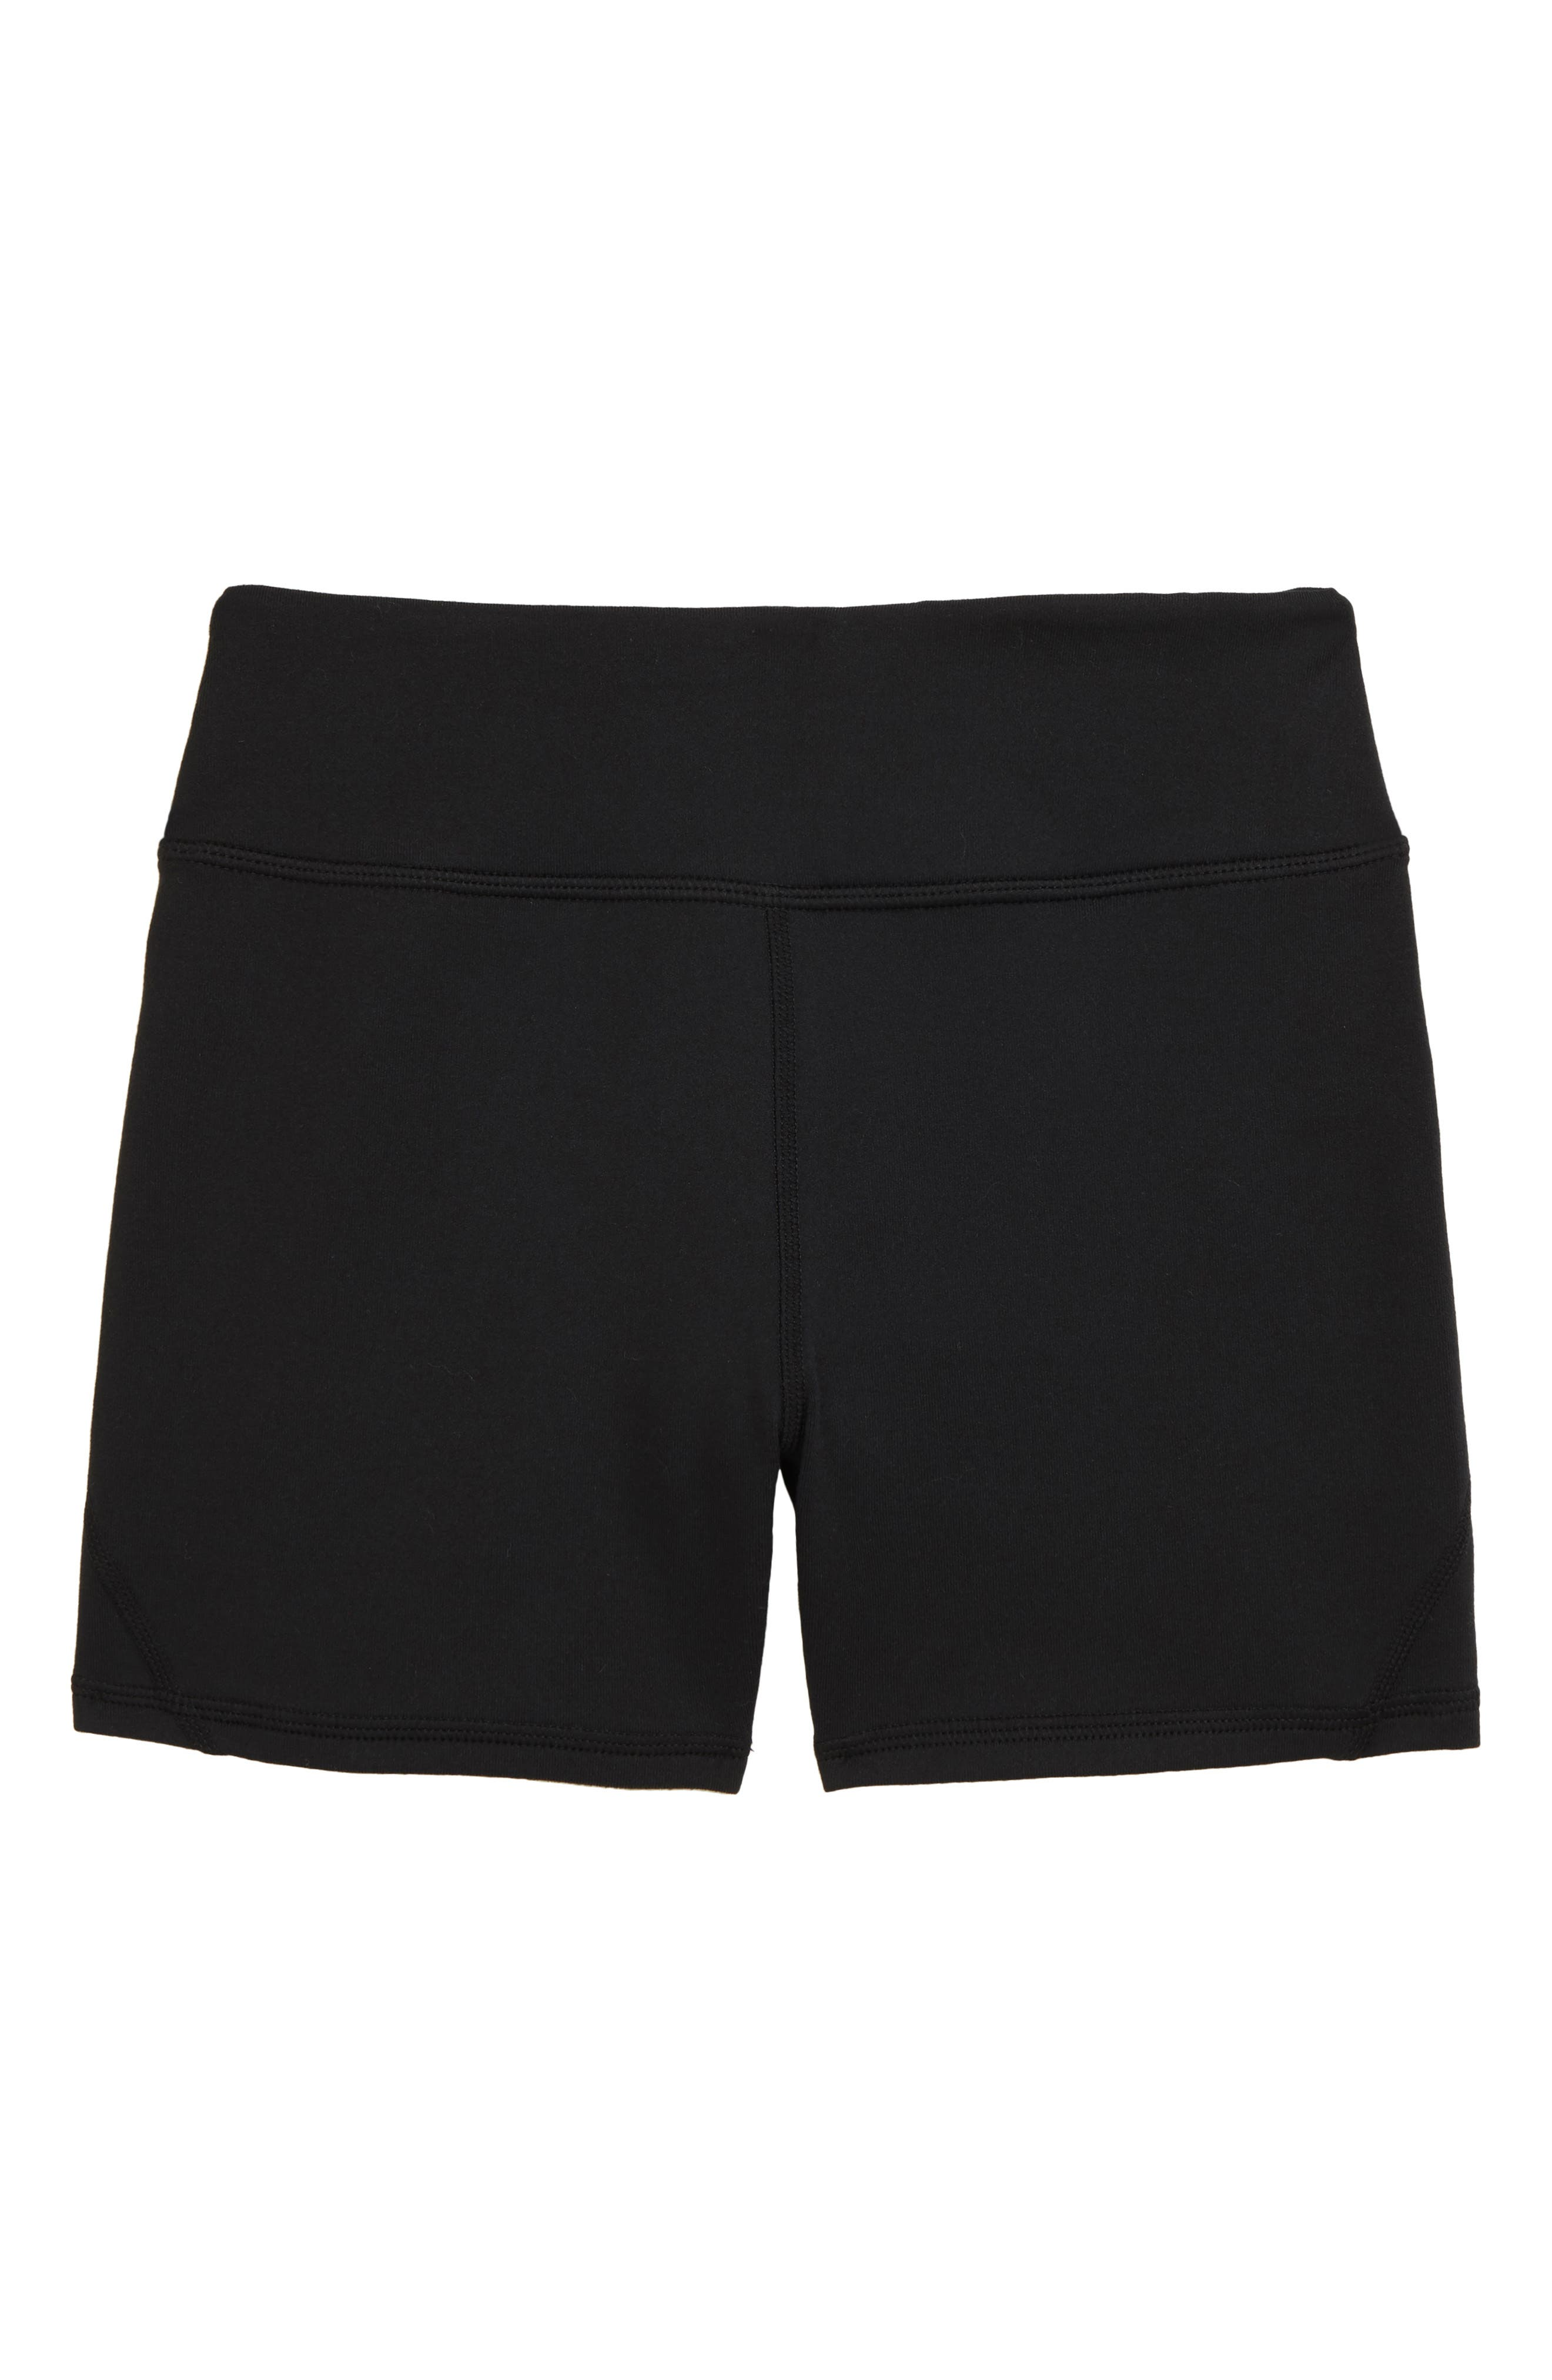 renvena Kids Girls Soft Cotton Elastic Waistband Athletic Training Shorts Gym Exercise Activewear Casual Wear